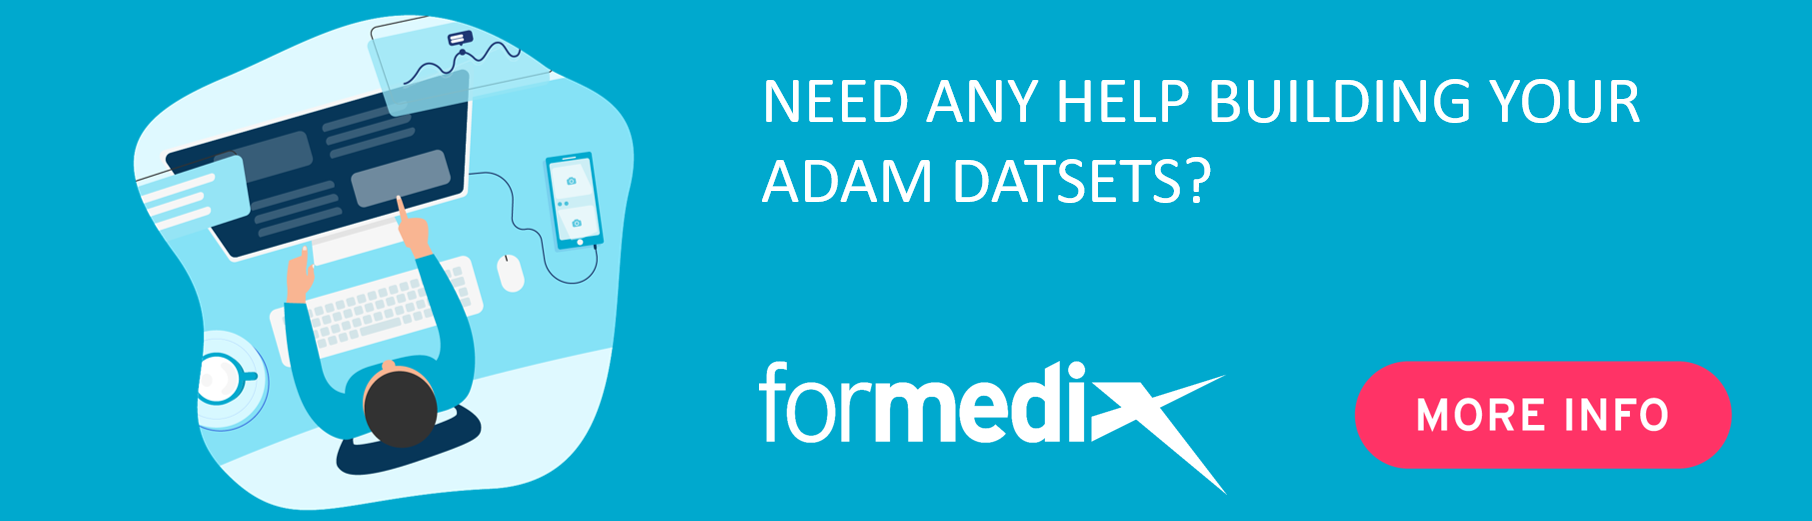 build-cdisc-adam-datasets